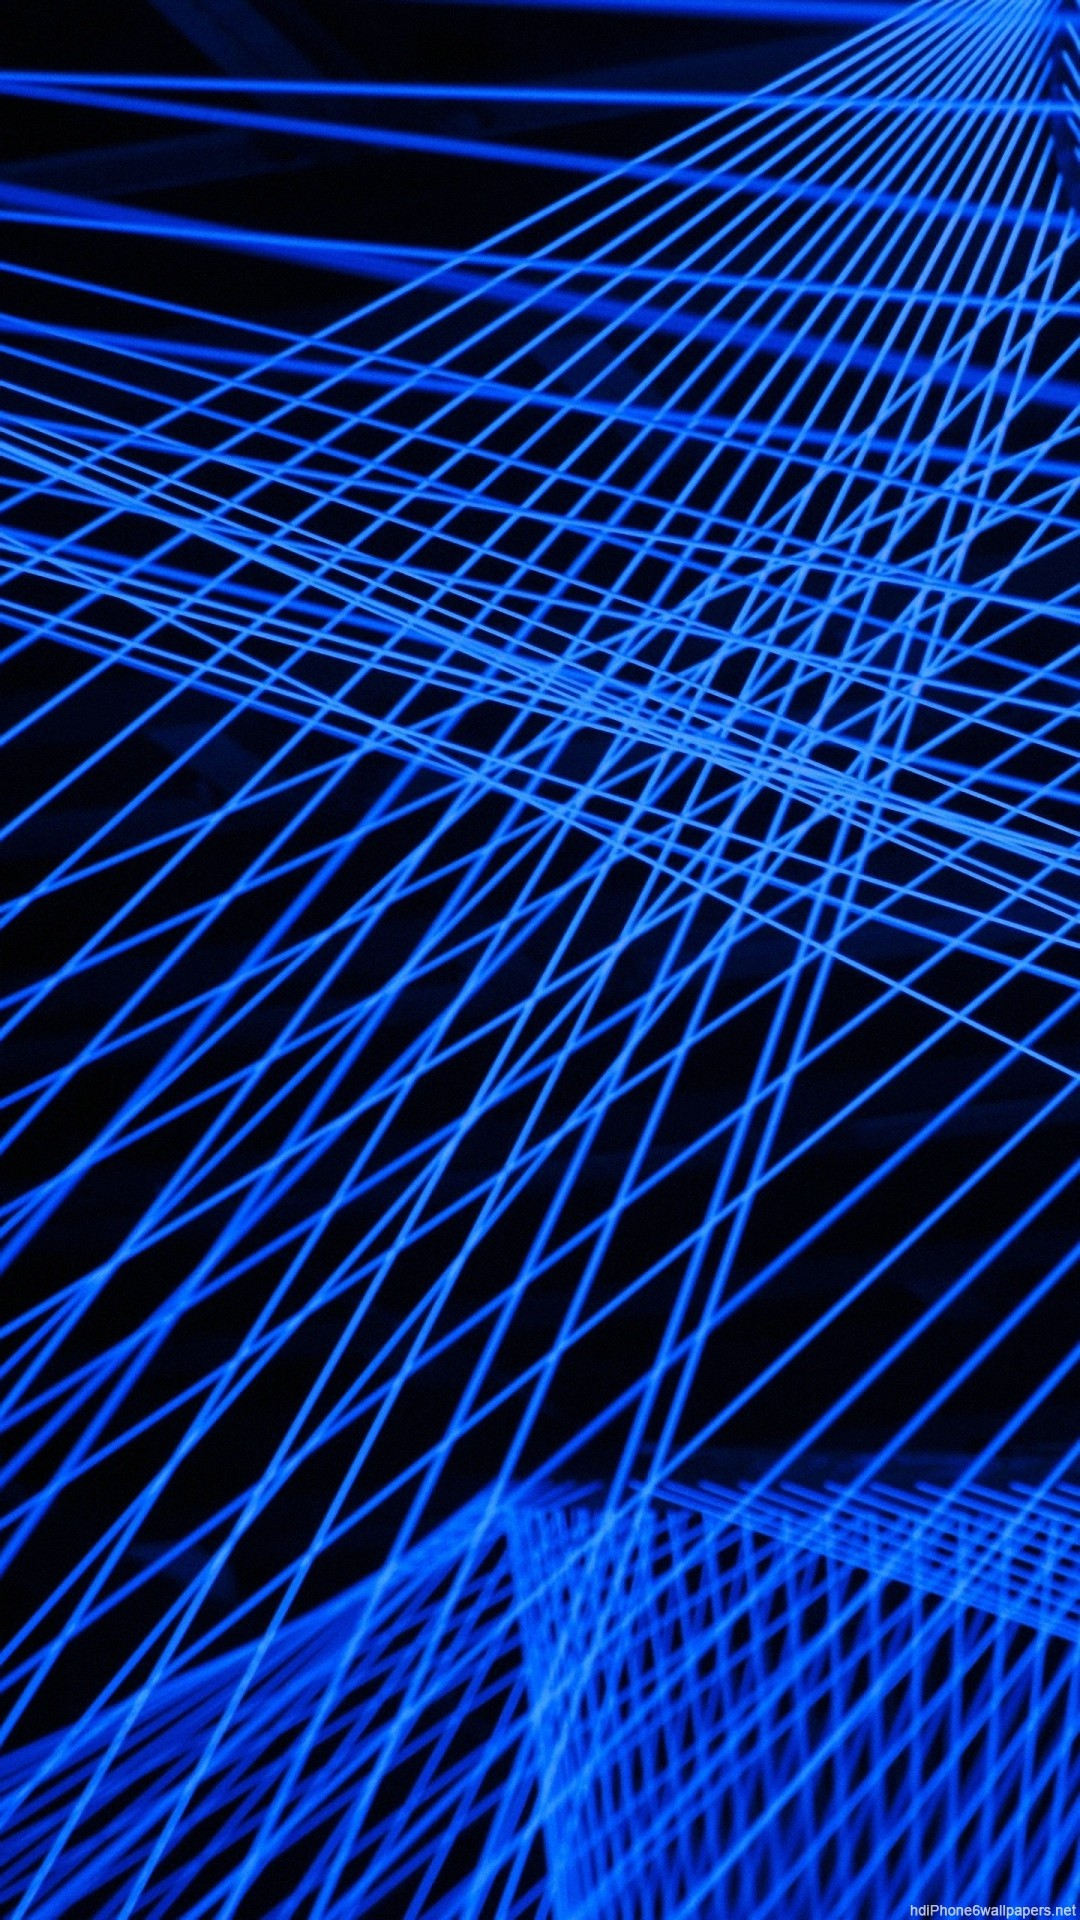 Dimond wallpaper 70 images 1920x1080 9 diamond co wallpaper9 600x338 voltagebd Gallery